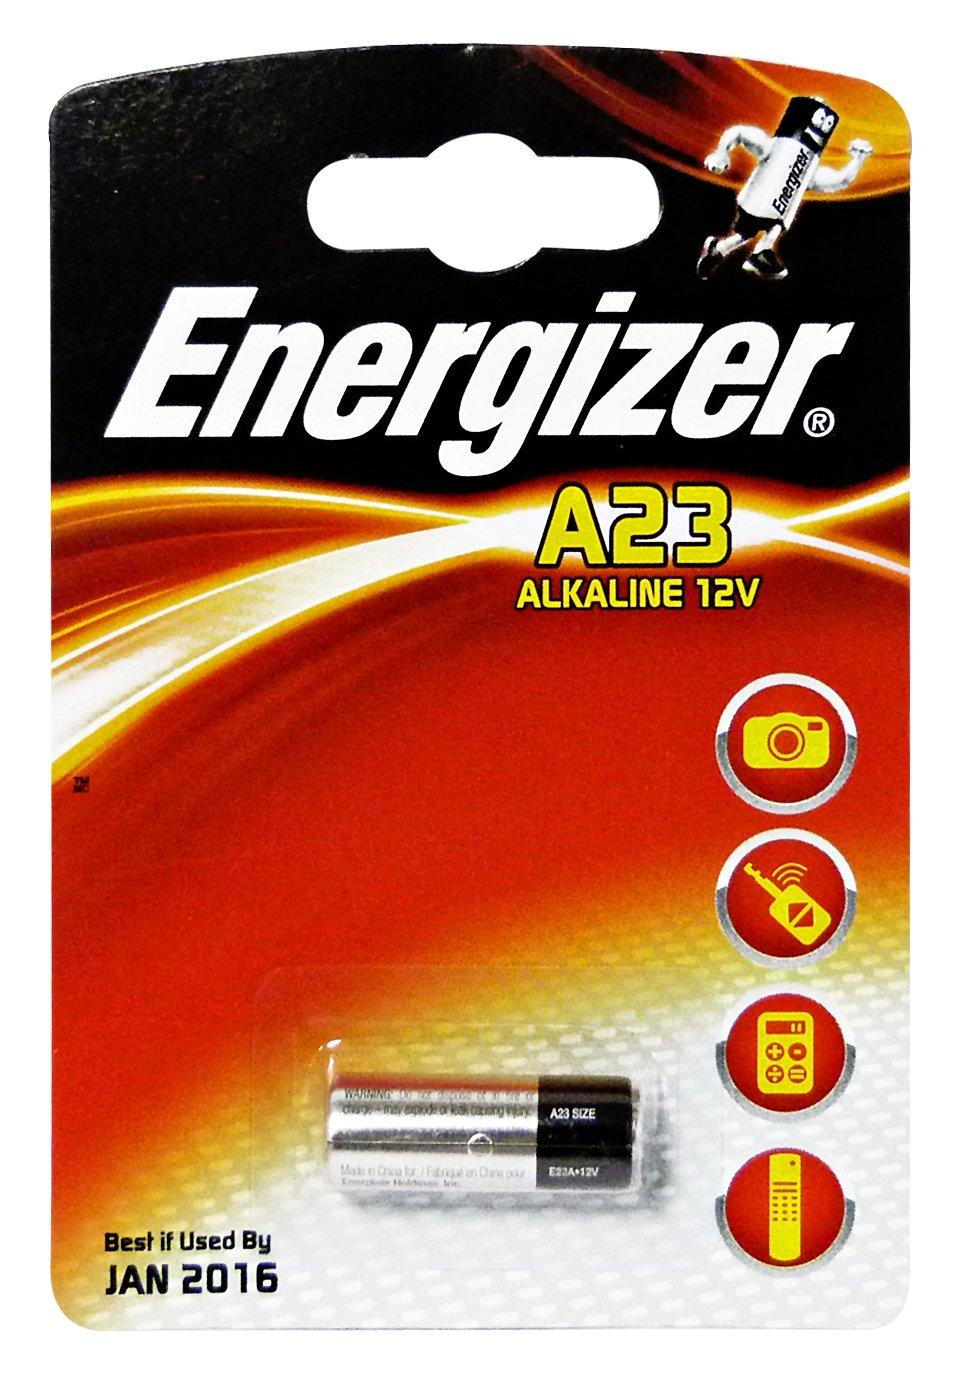 Energizer A23 Mn21 Lrv08 Gp23a 12v Alkaline Battery Amazon